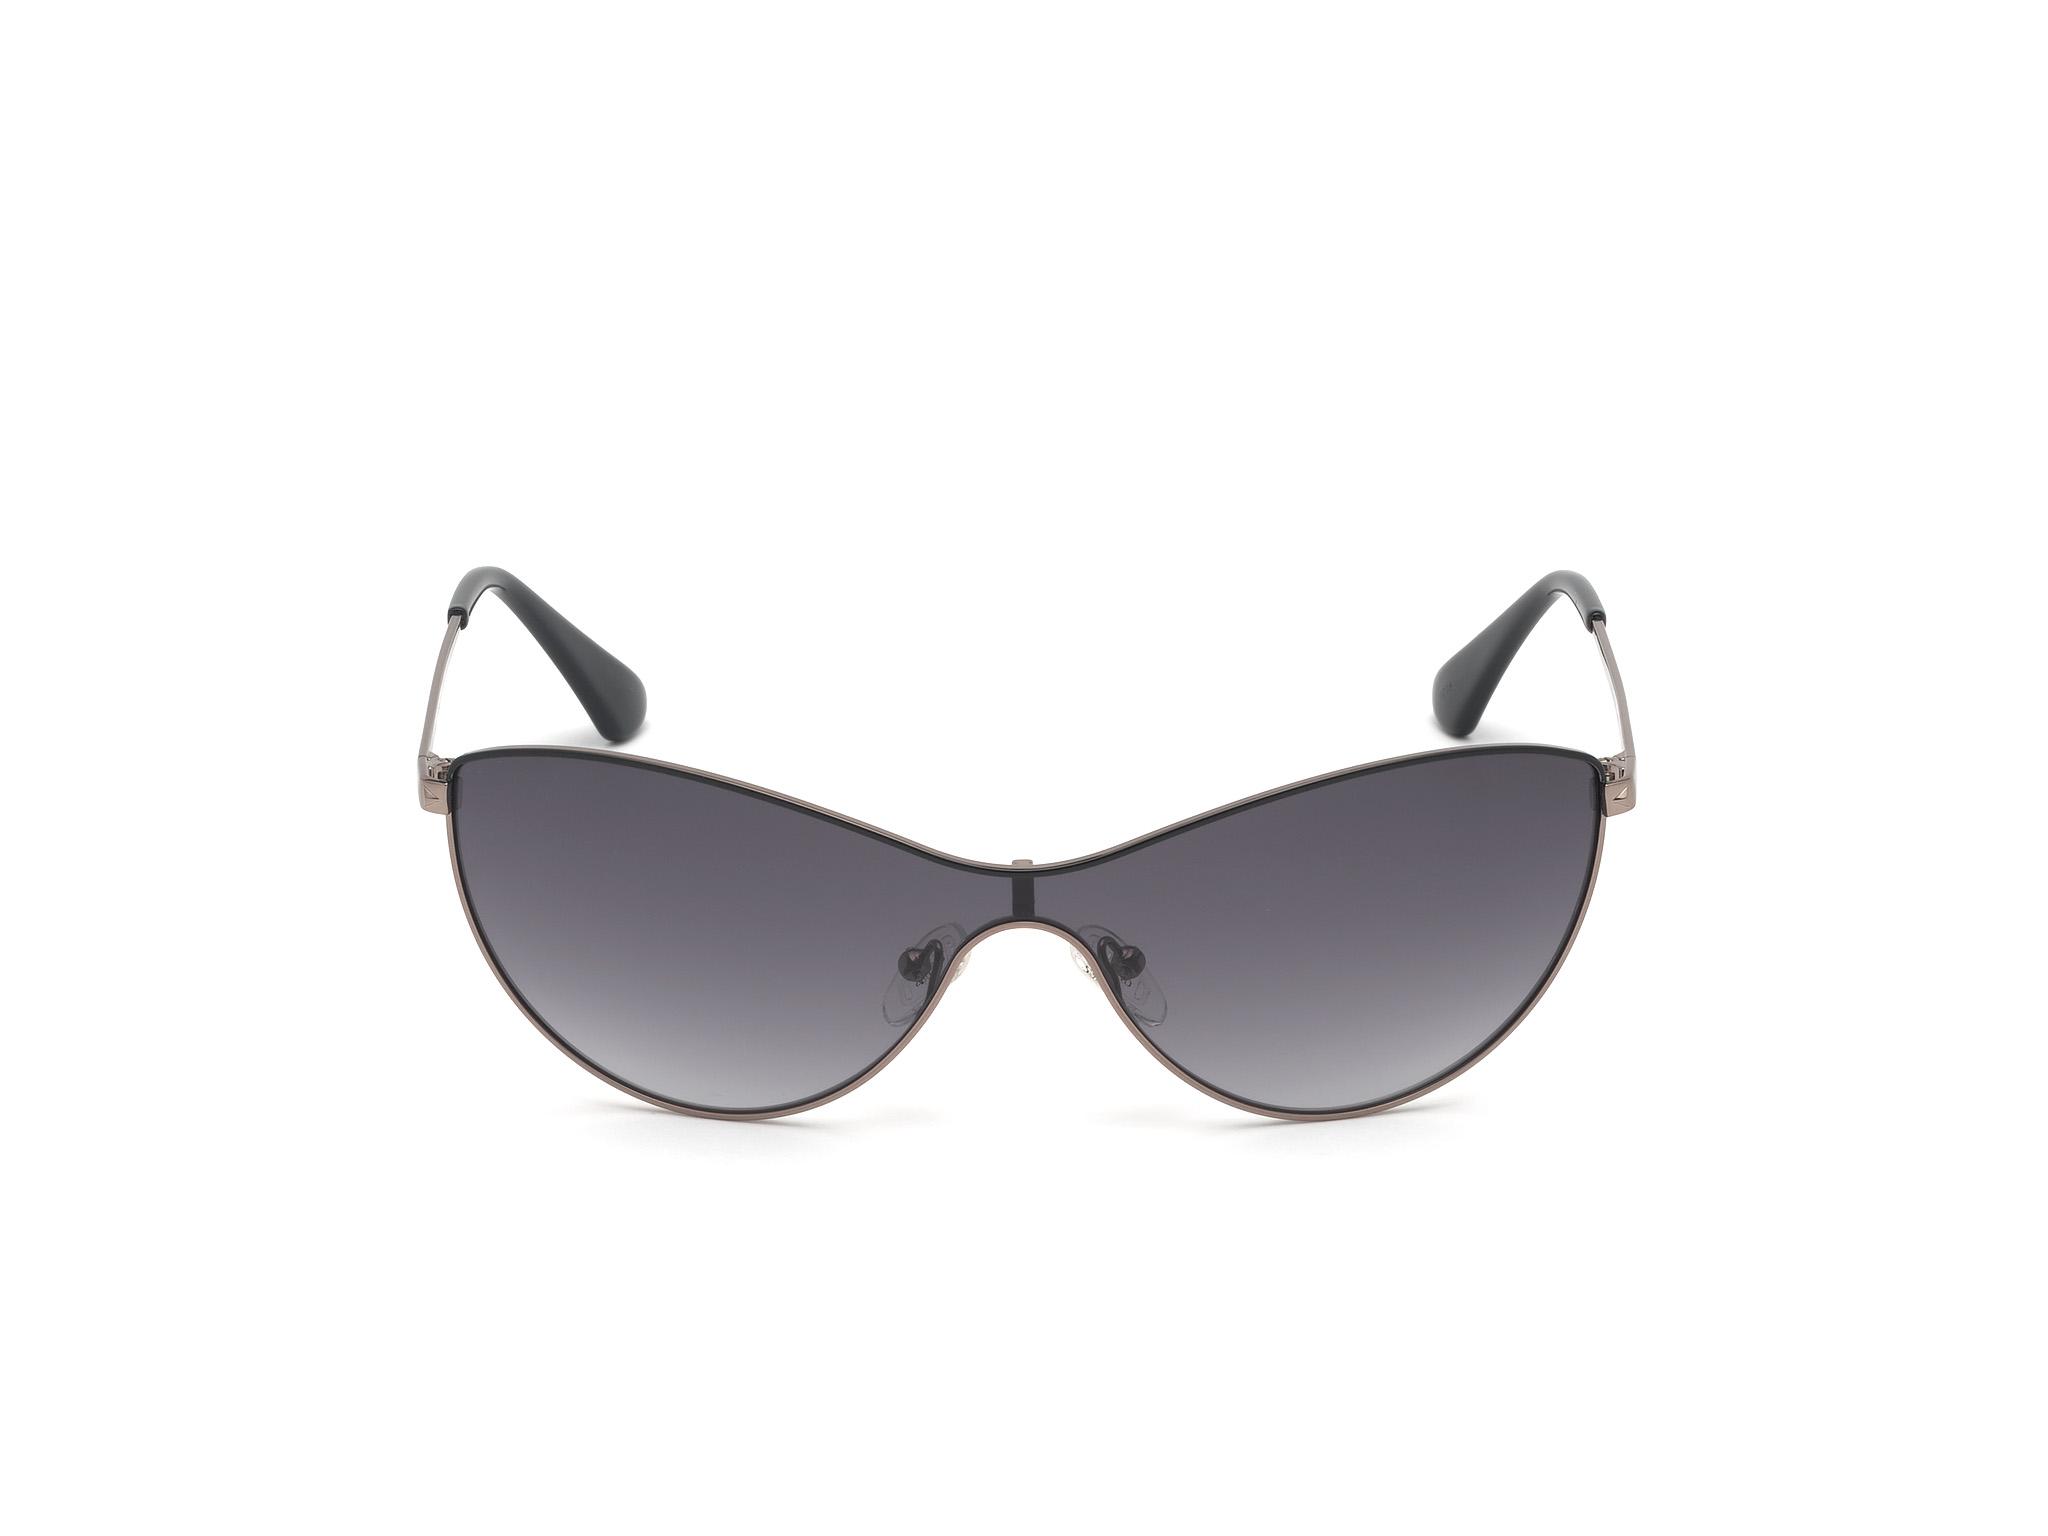 GUESS | Guess Black Frame With Grey Lens Cat Eye Shape Women Sunglass